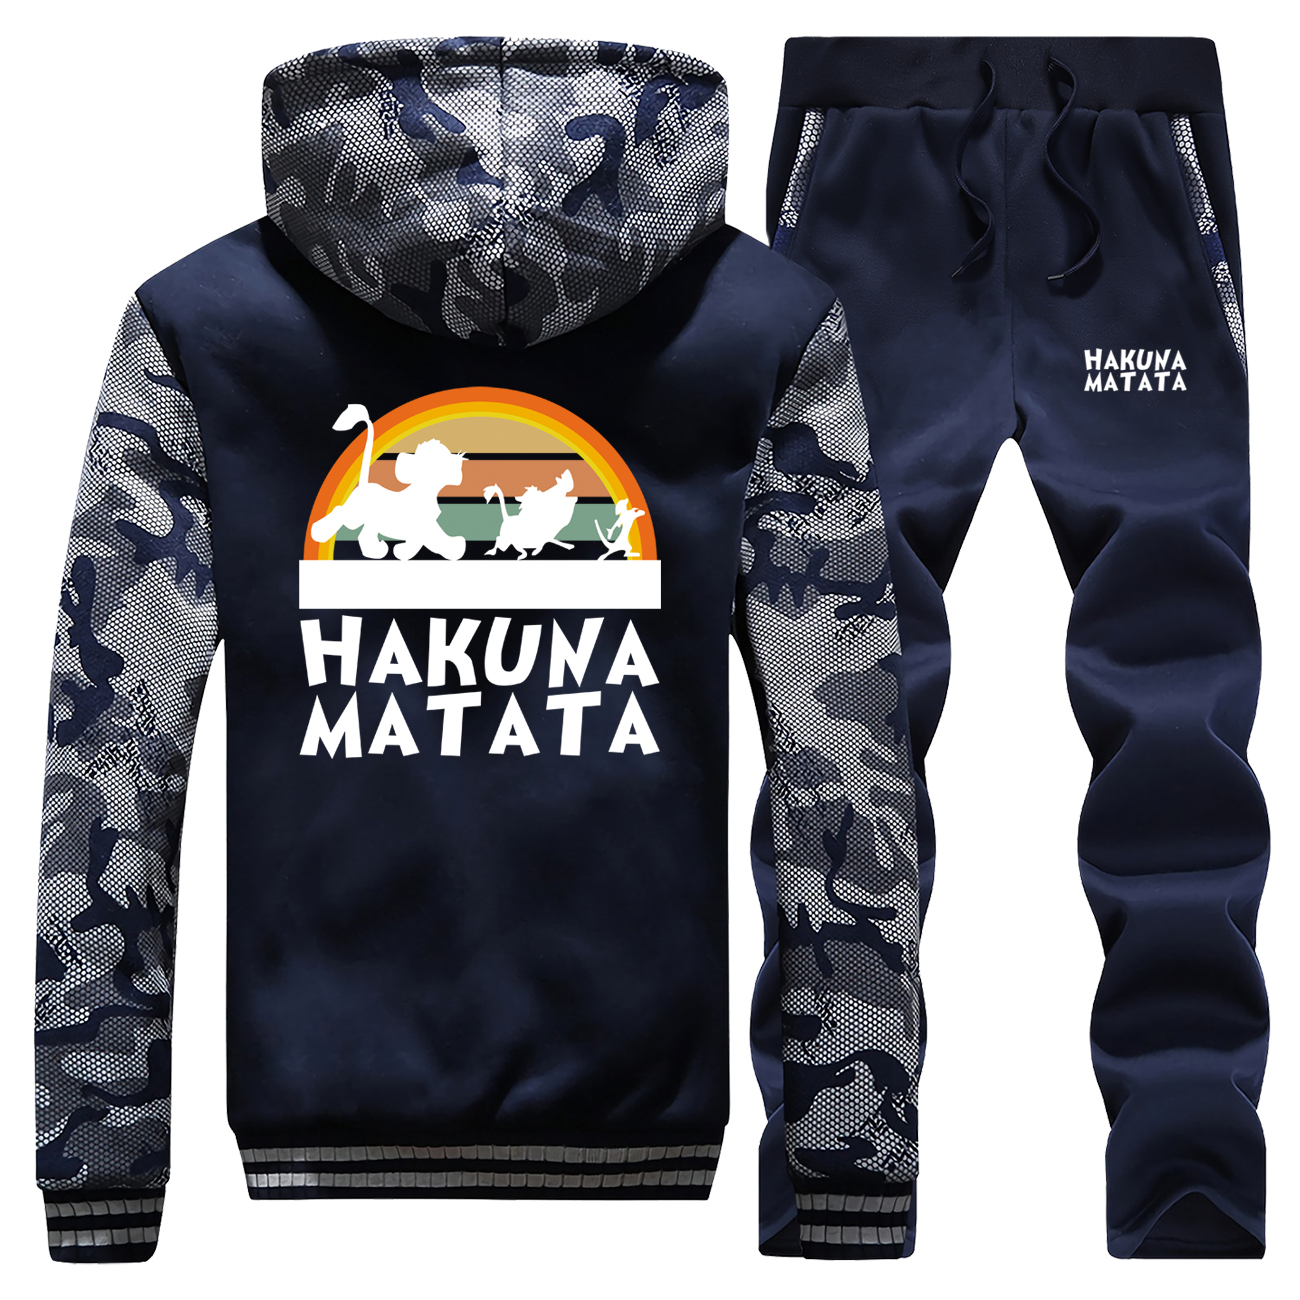 Hakuna Matata Fleece Sweatshirts Men Casual Fleece Lion King Camo Hoodies Pant 2pcs Sets Men Harajuku Animal Kingdom Streetwear